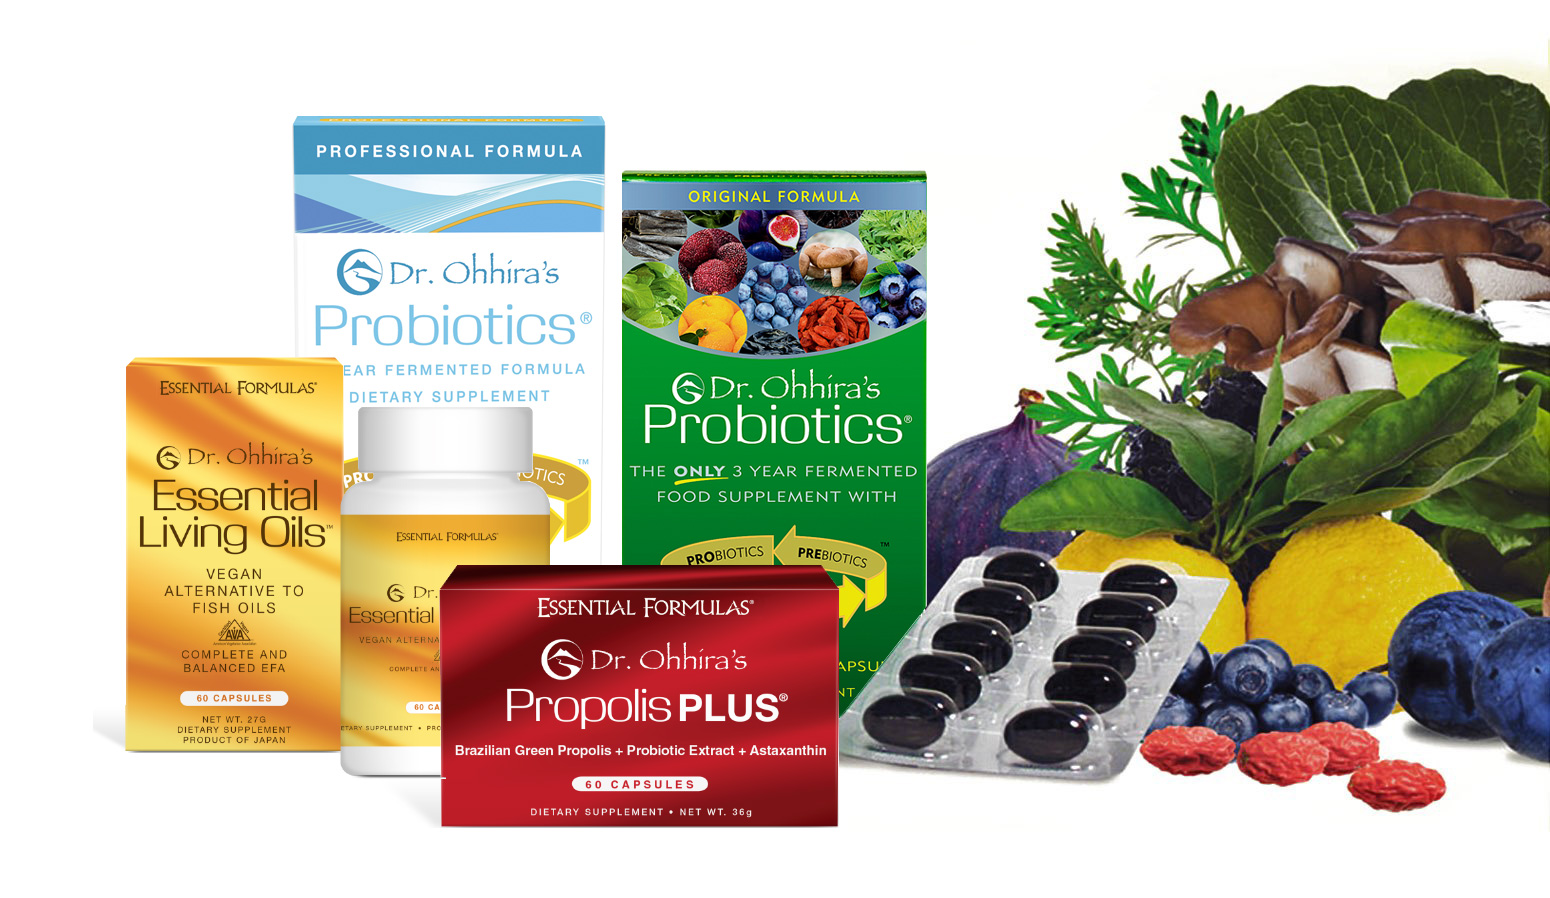 Dr Ohhira Probiotics On Sale Probiotics Supplements Probiotic